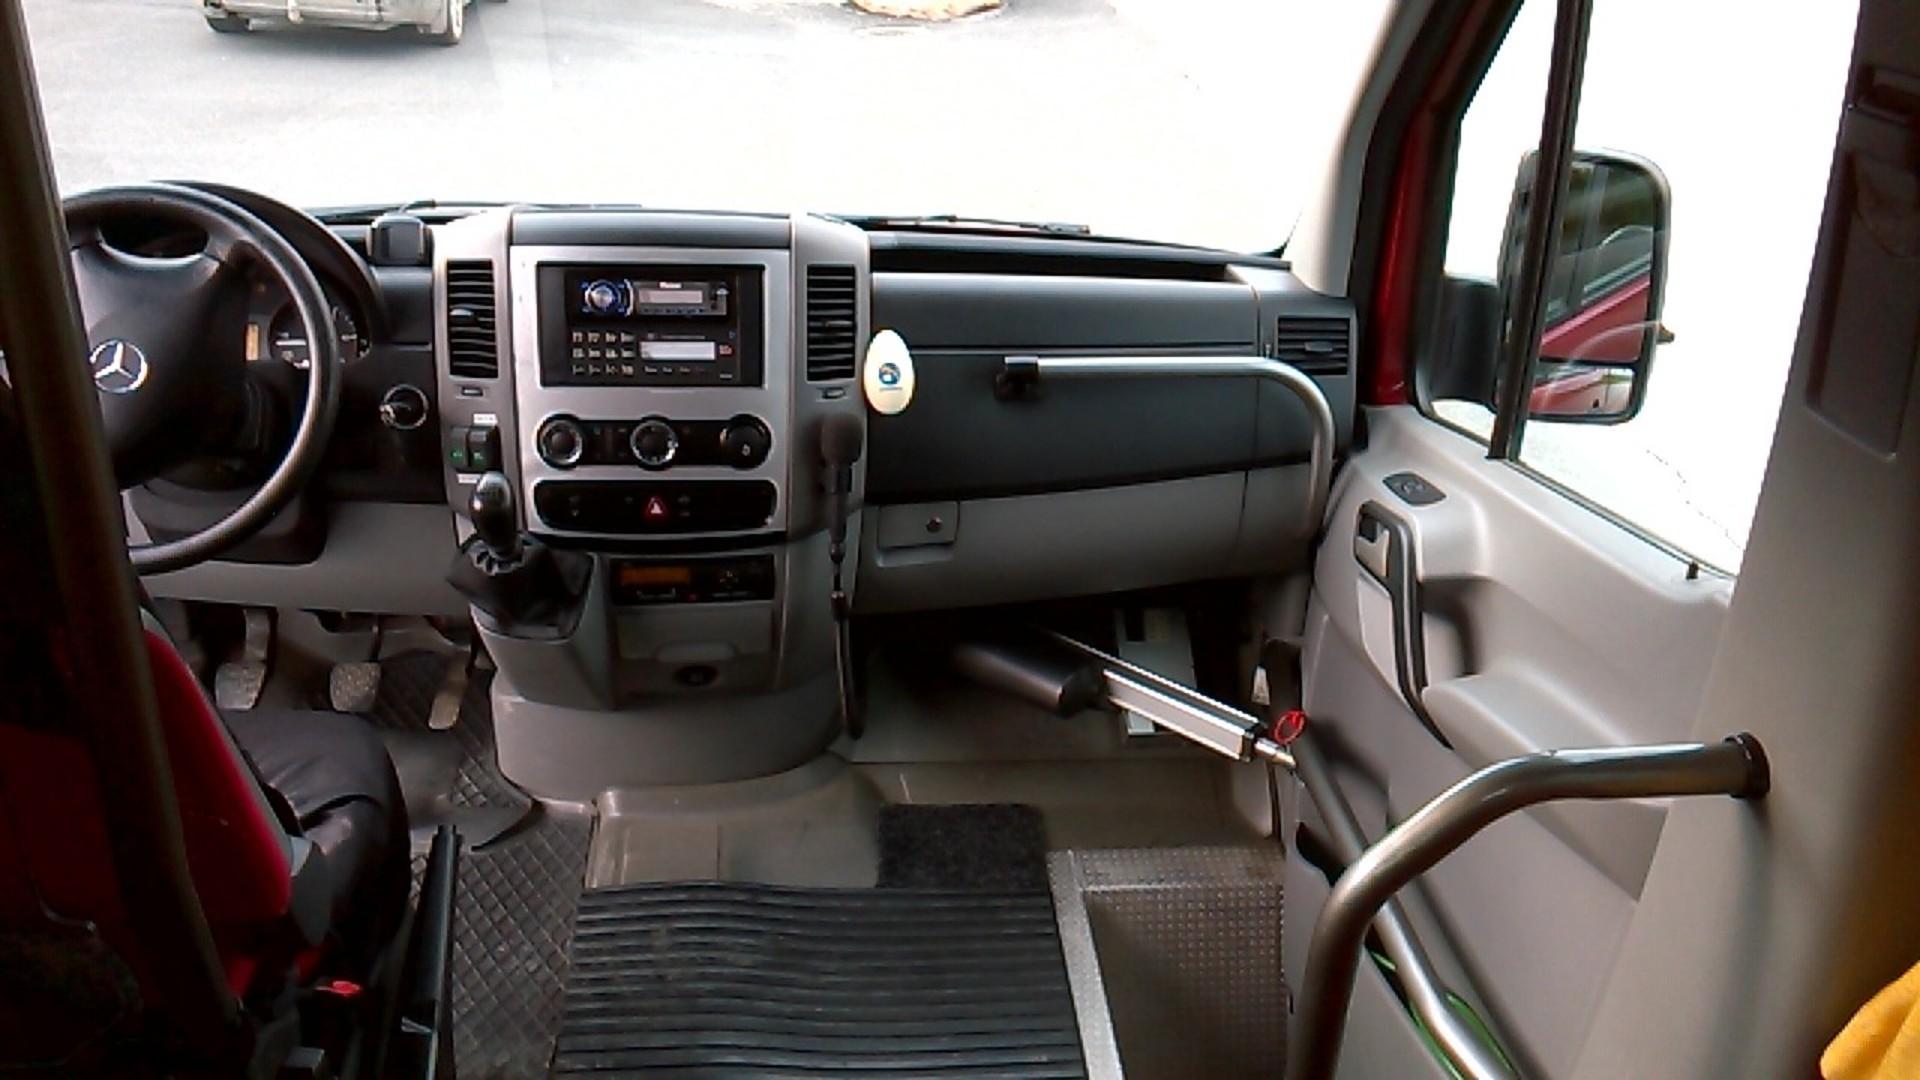 Mercedes-Benz Sprinter, 519 CDI Tamlans 17 paikkaa